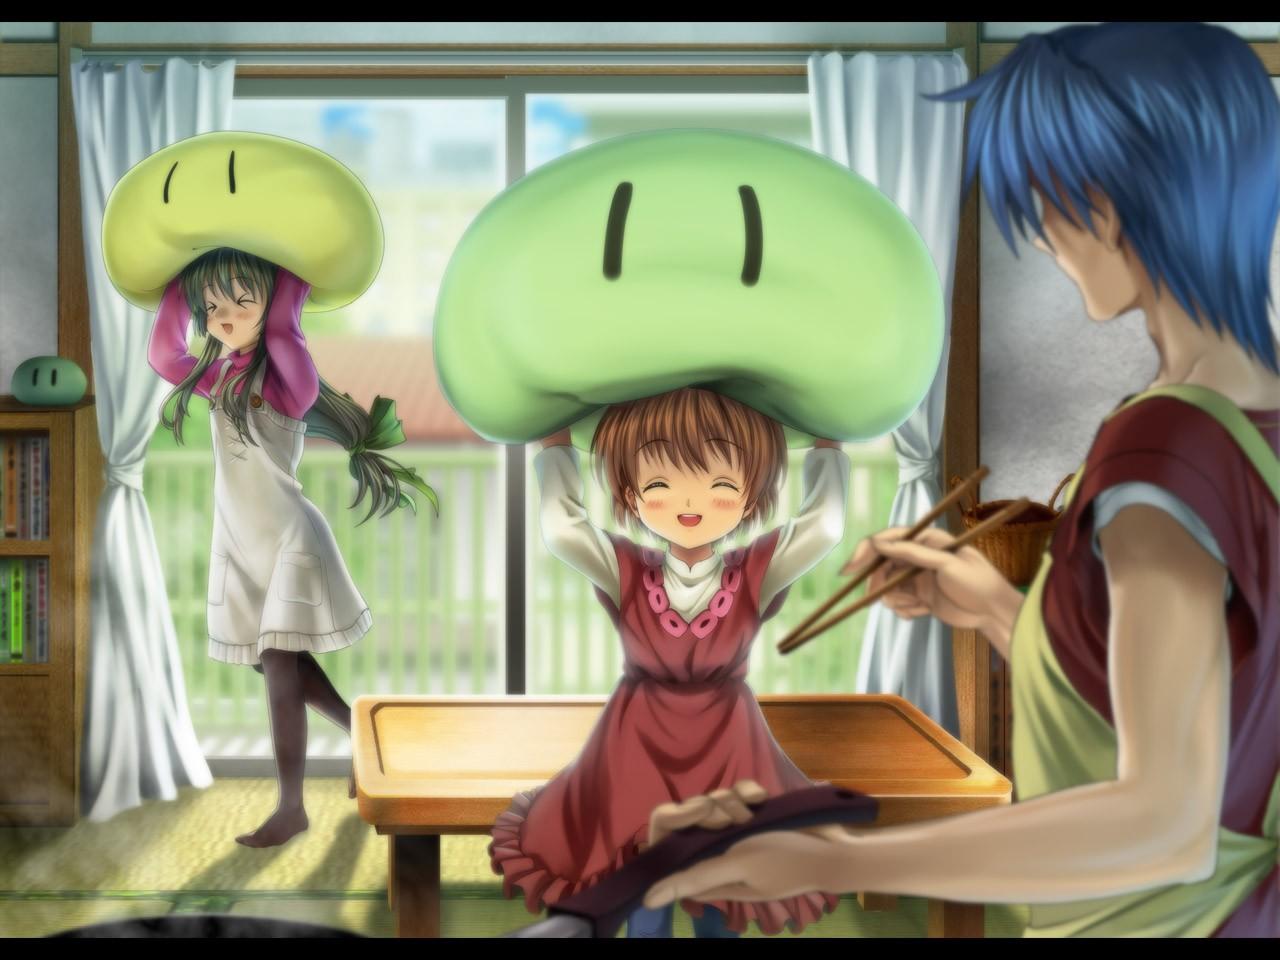 Wallpaper Illustration Anime Girls Cartoon Clannad Tomoya Okazaki Ushio Okazaki Ibuki Fuko Dango Screenshot Mangaka 1280x960 Ludendorf 20095 Hd Wallpapers Wallhere